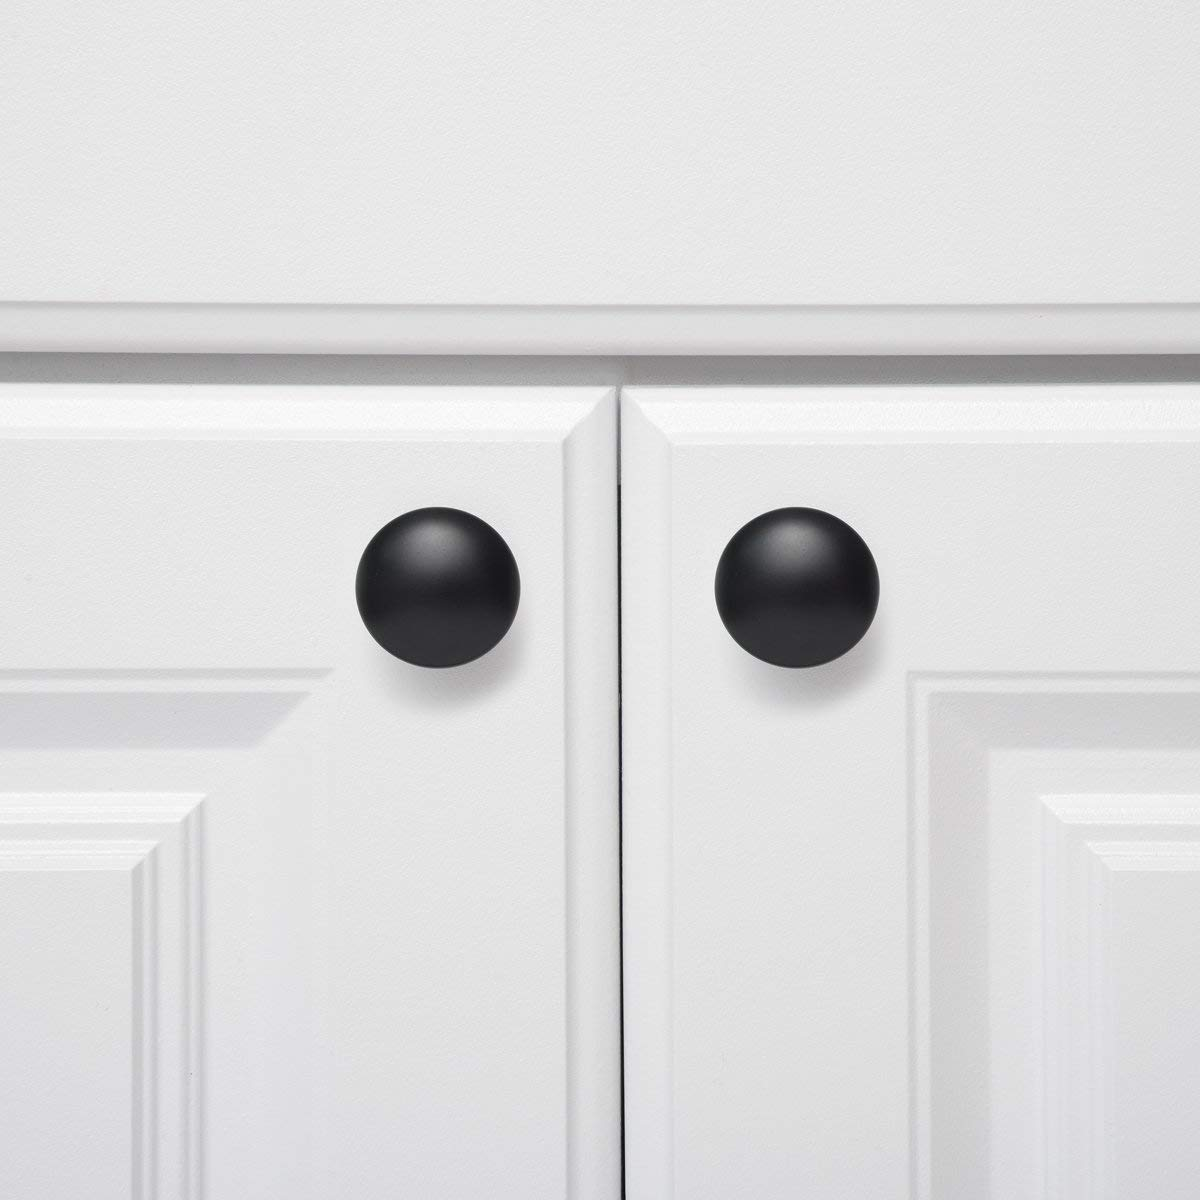 mueble de armario un solo agujero con tornillos de 25 mm para armario de aleaci/ón de aluminio 10 unidades redondeados Pomos para armario cuadrados GOODCHANCEUK